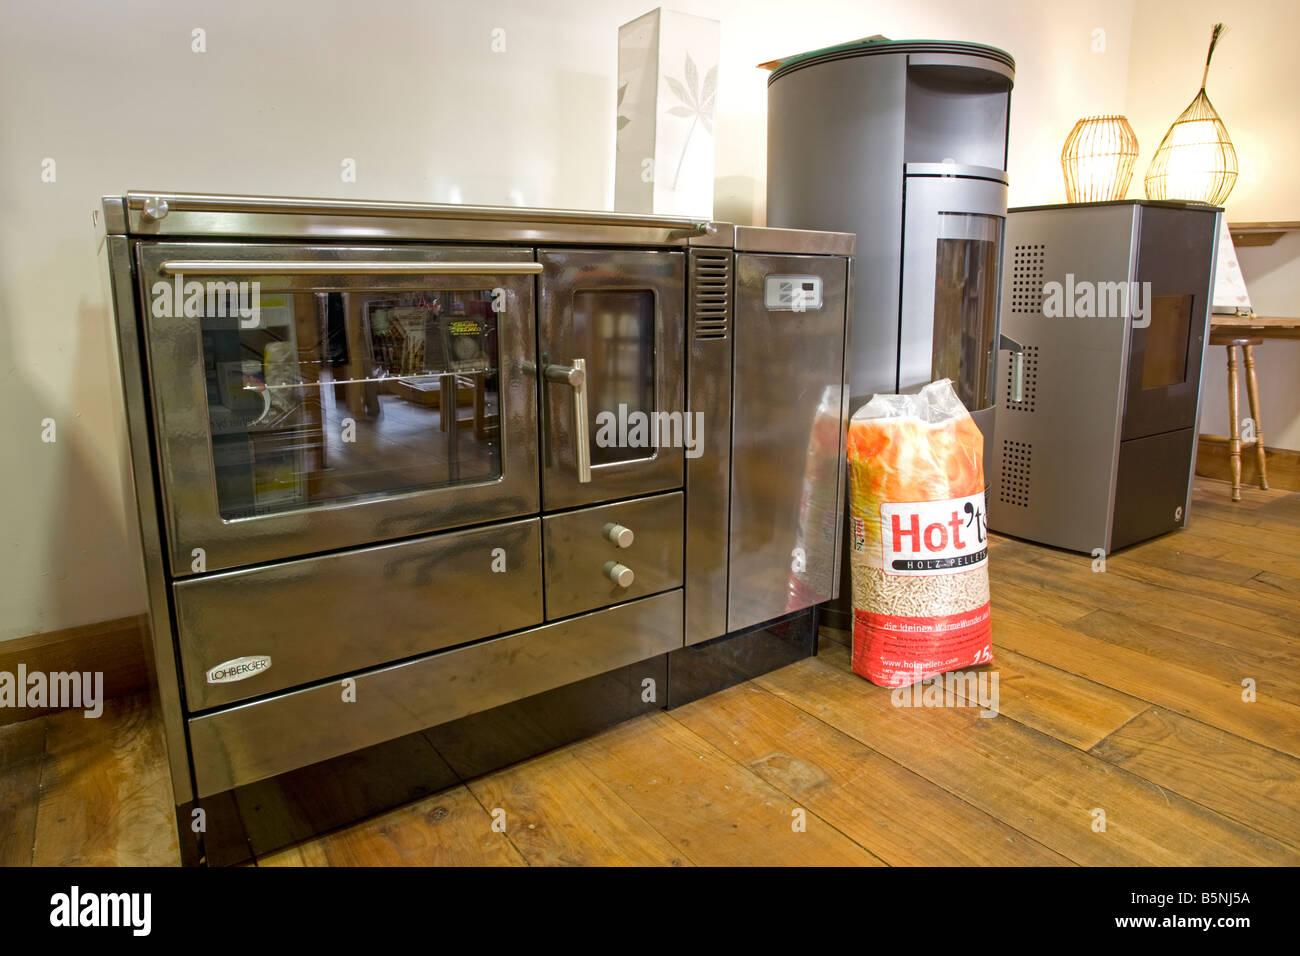 Modern German stainless steel wood pellet cooking and heating stoves Green Shop Bisley UK - Stock Image